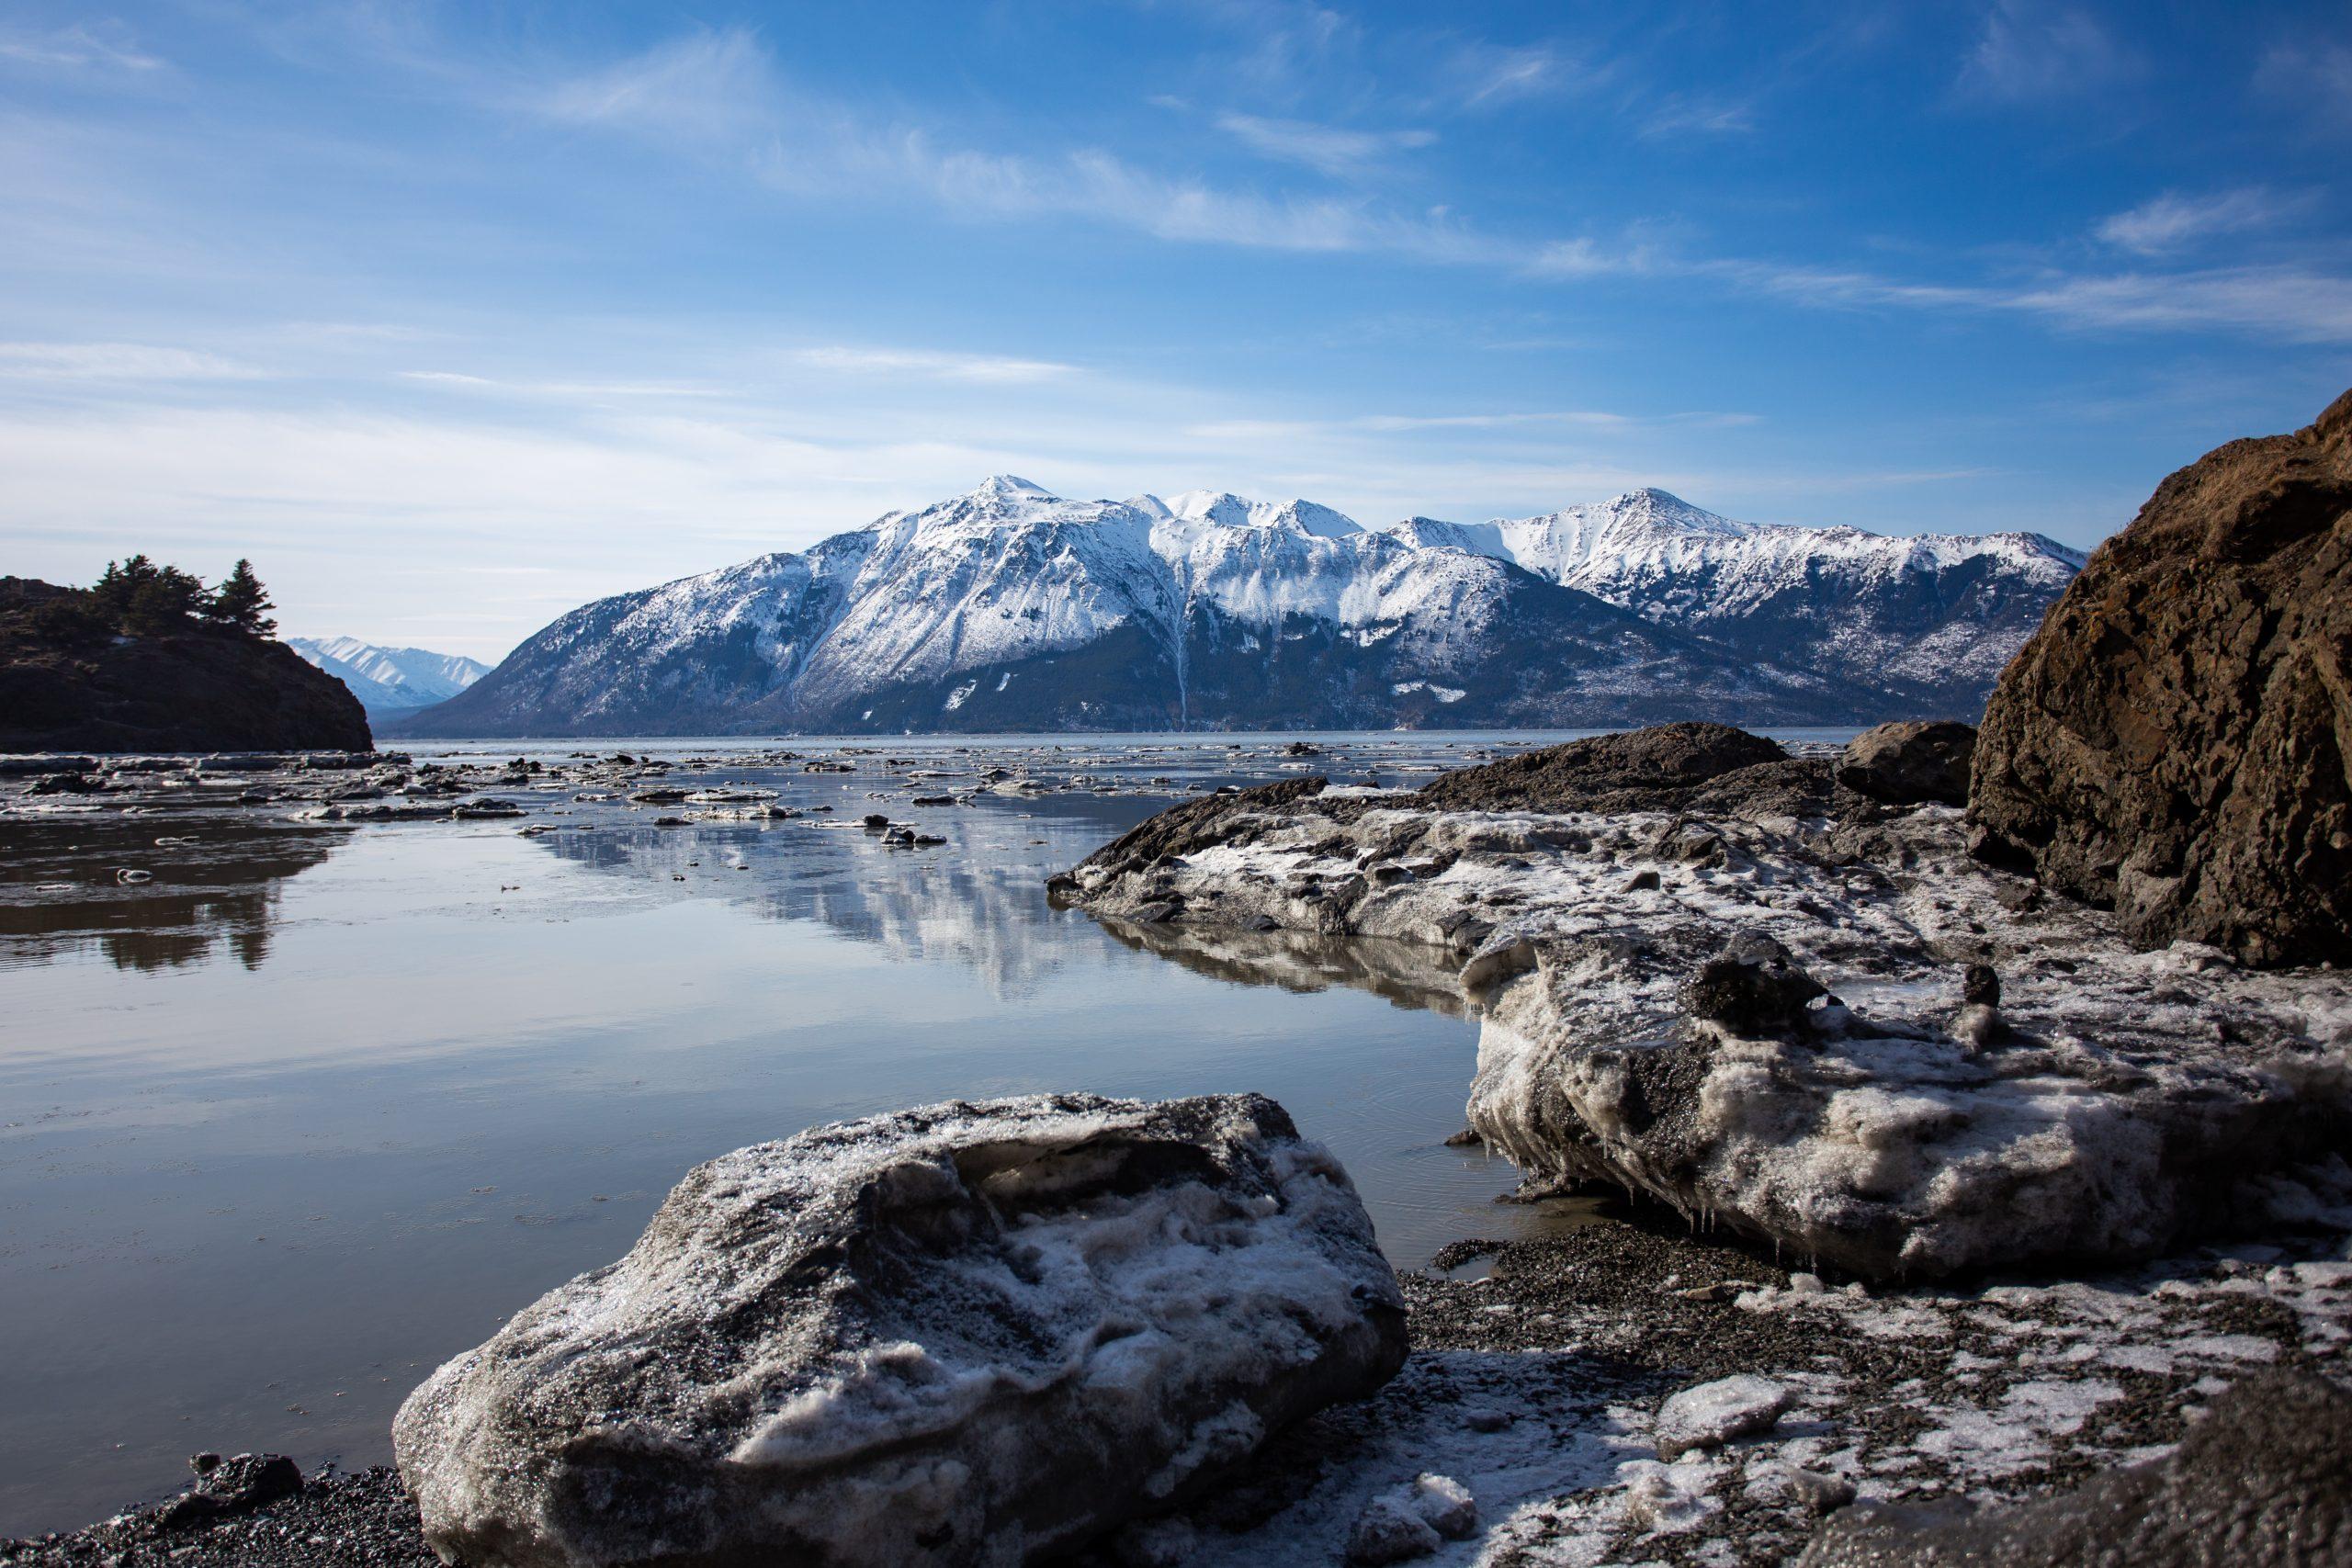 Wilderness, Wildlife & Glacier Experience from Anchorage